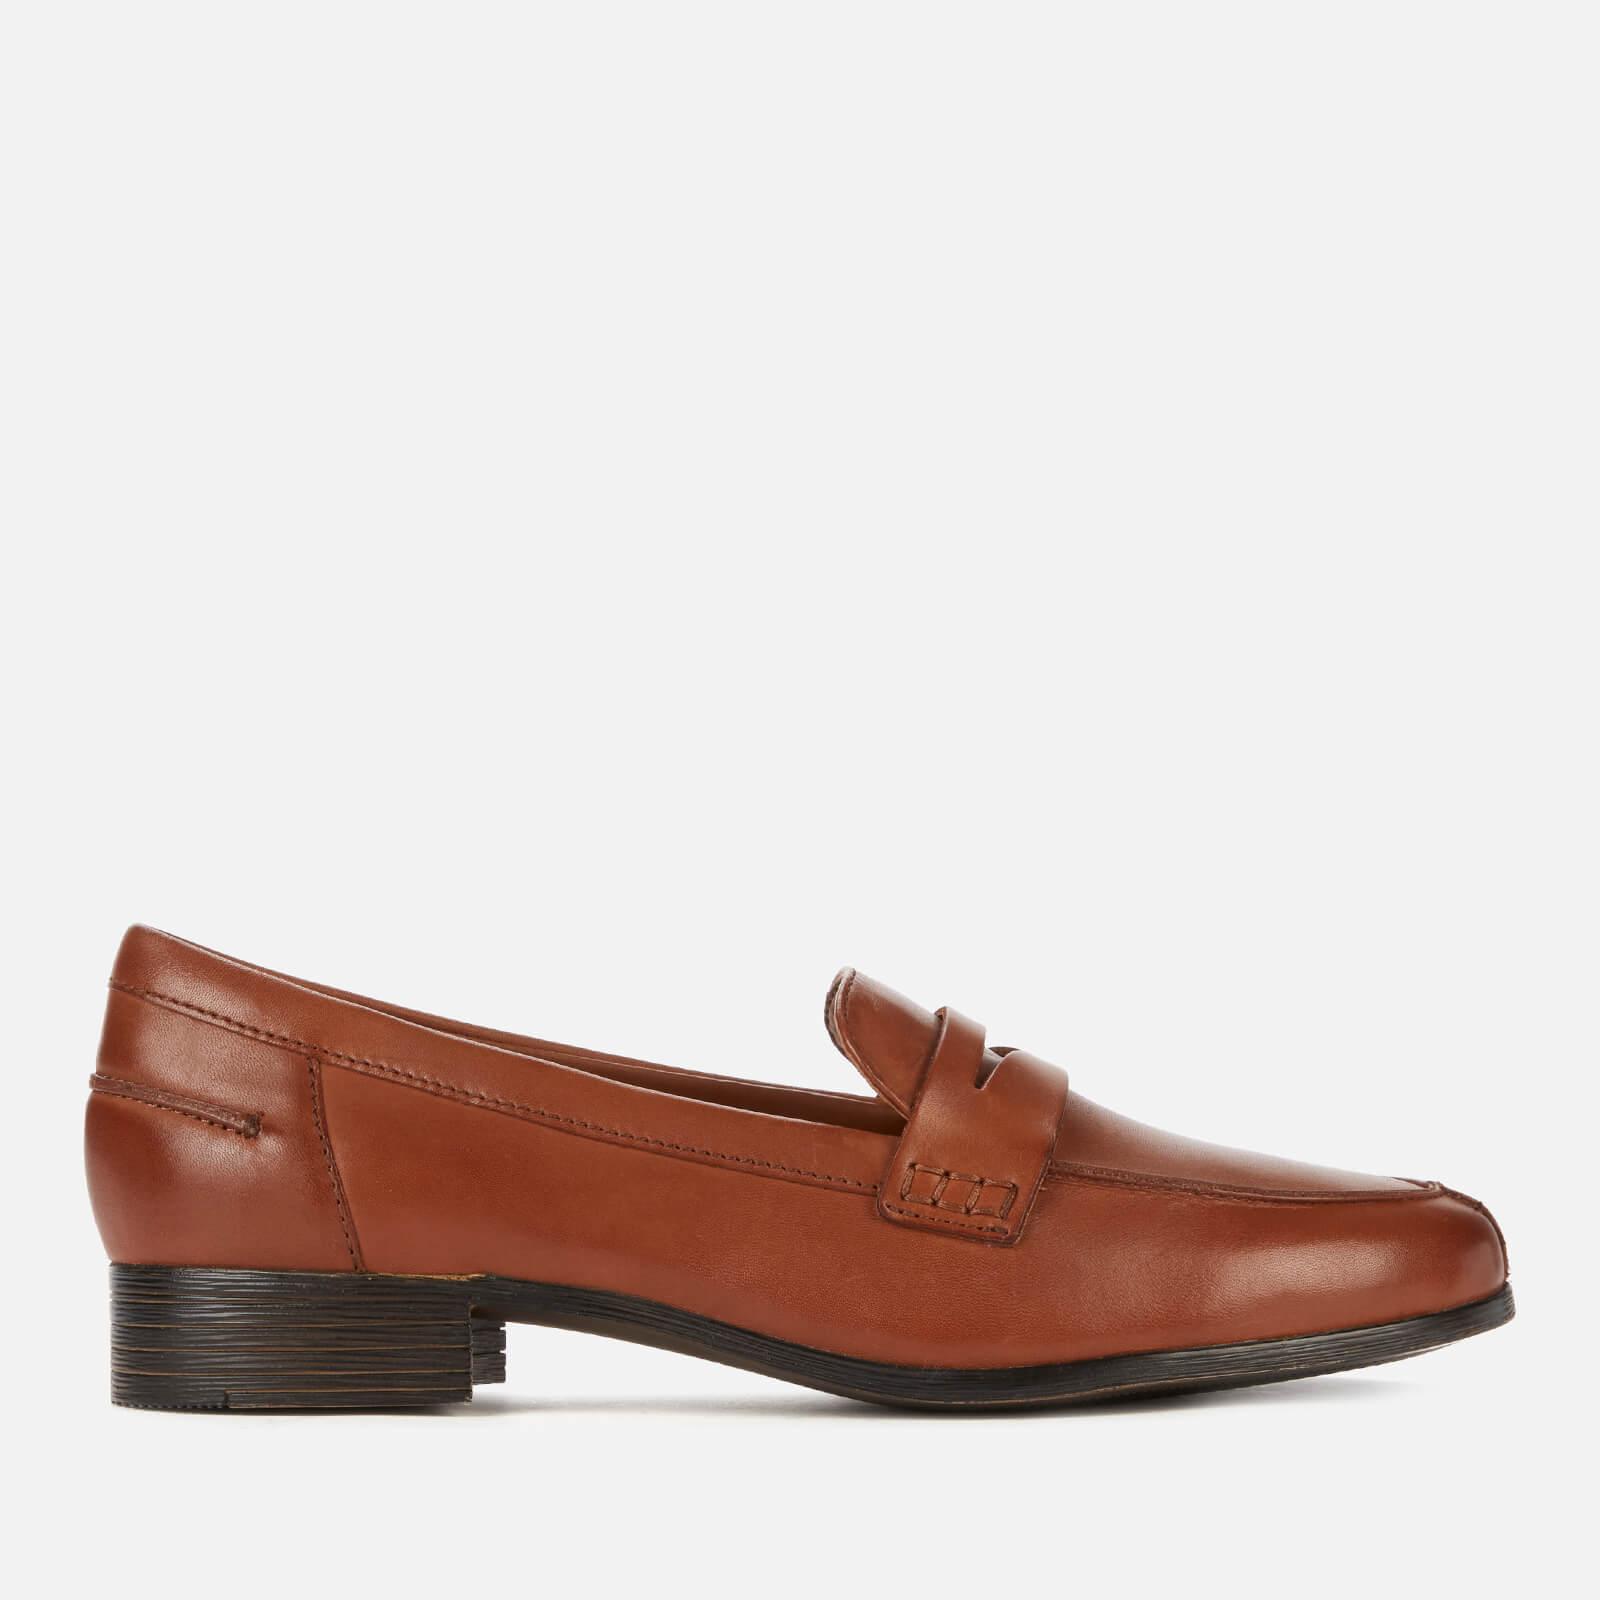 Clarks Women's Hamble Leather Loafers - Tan - Uk 8